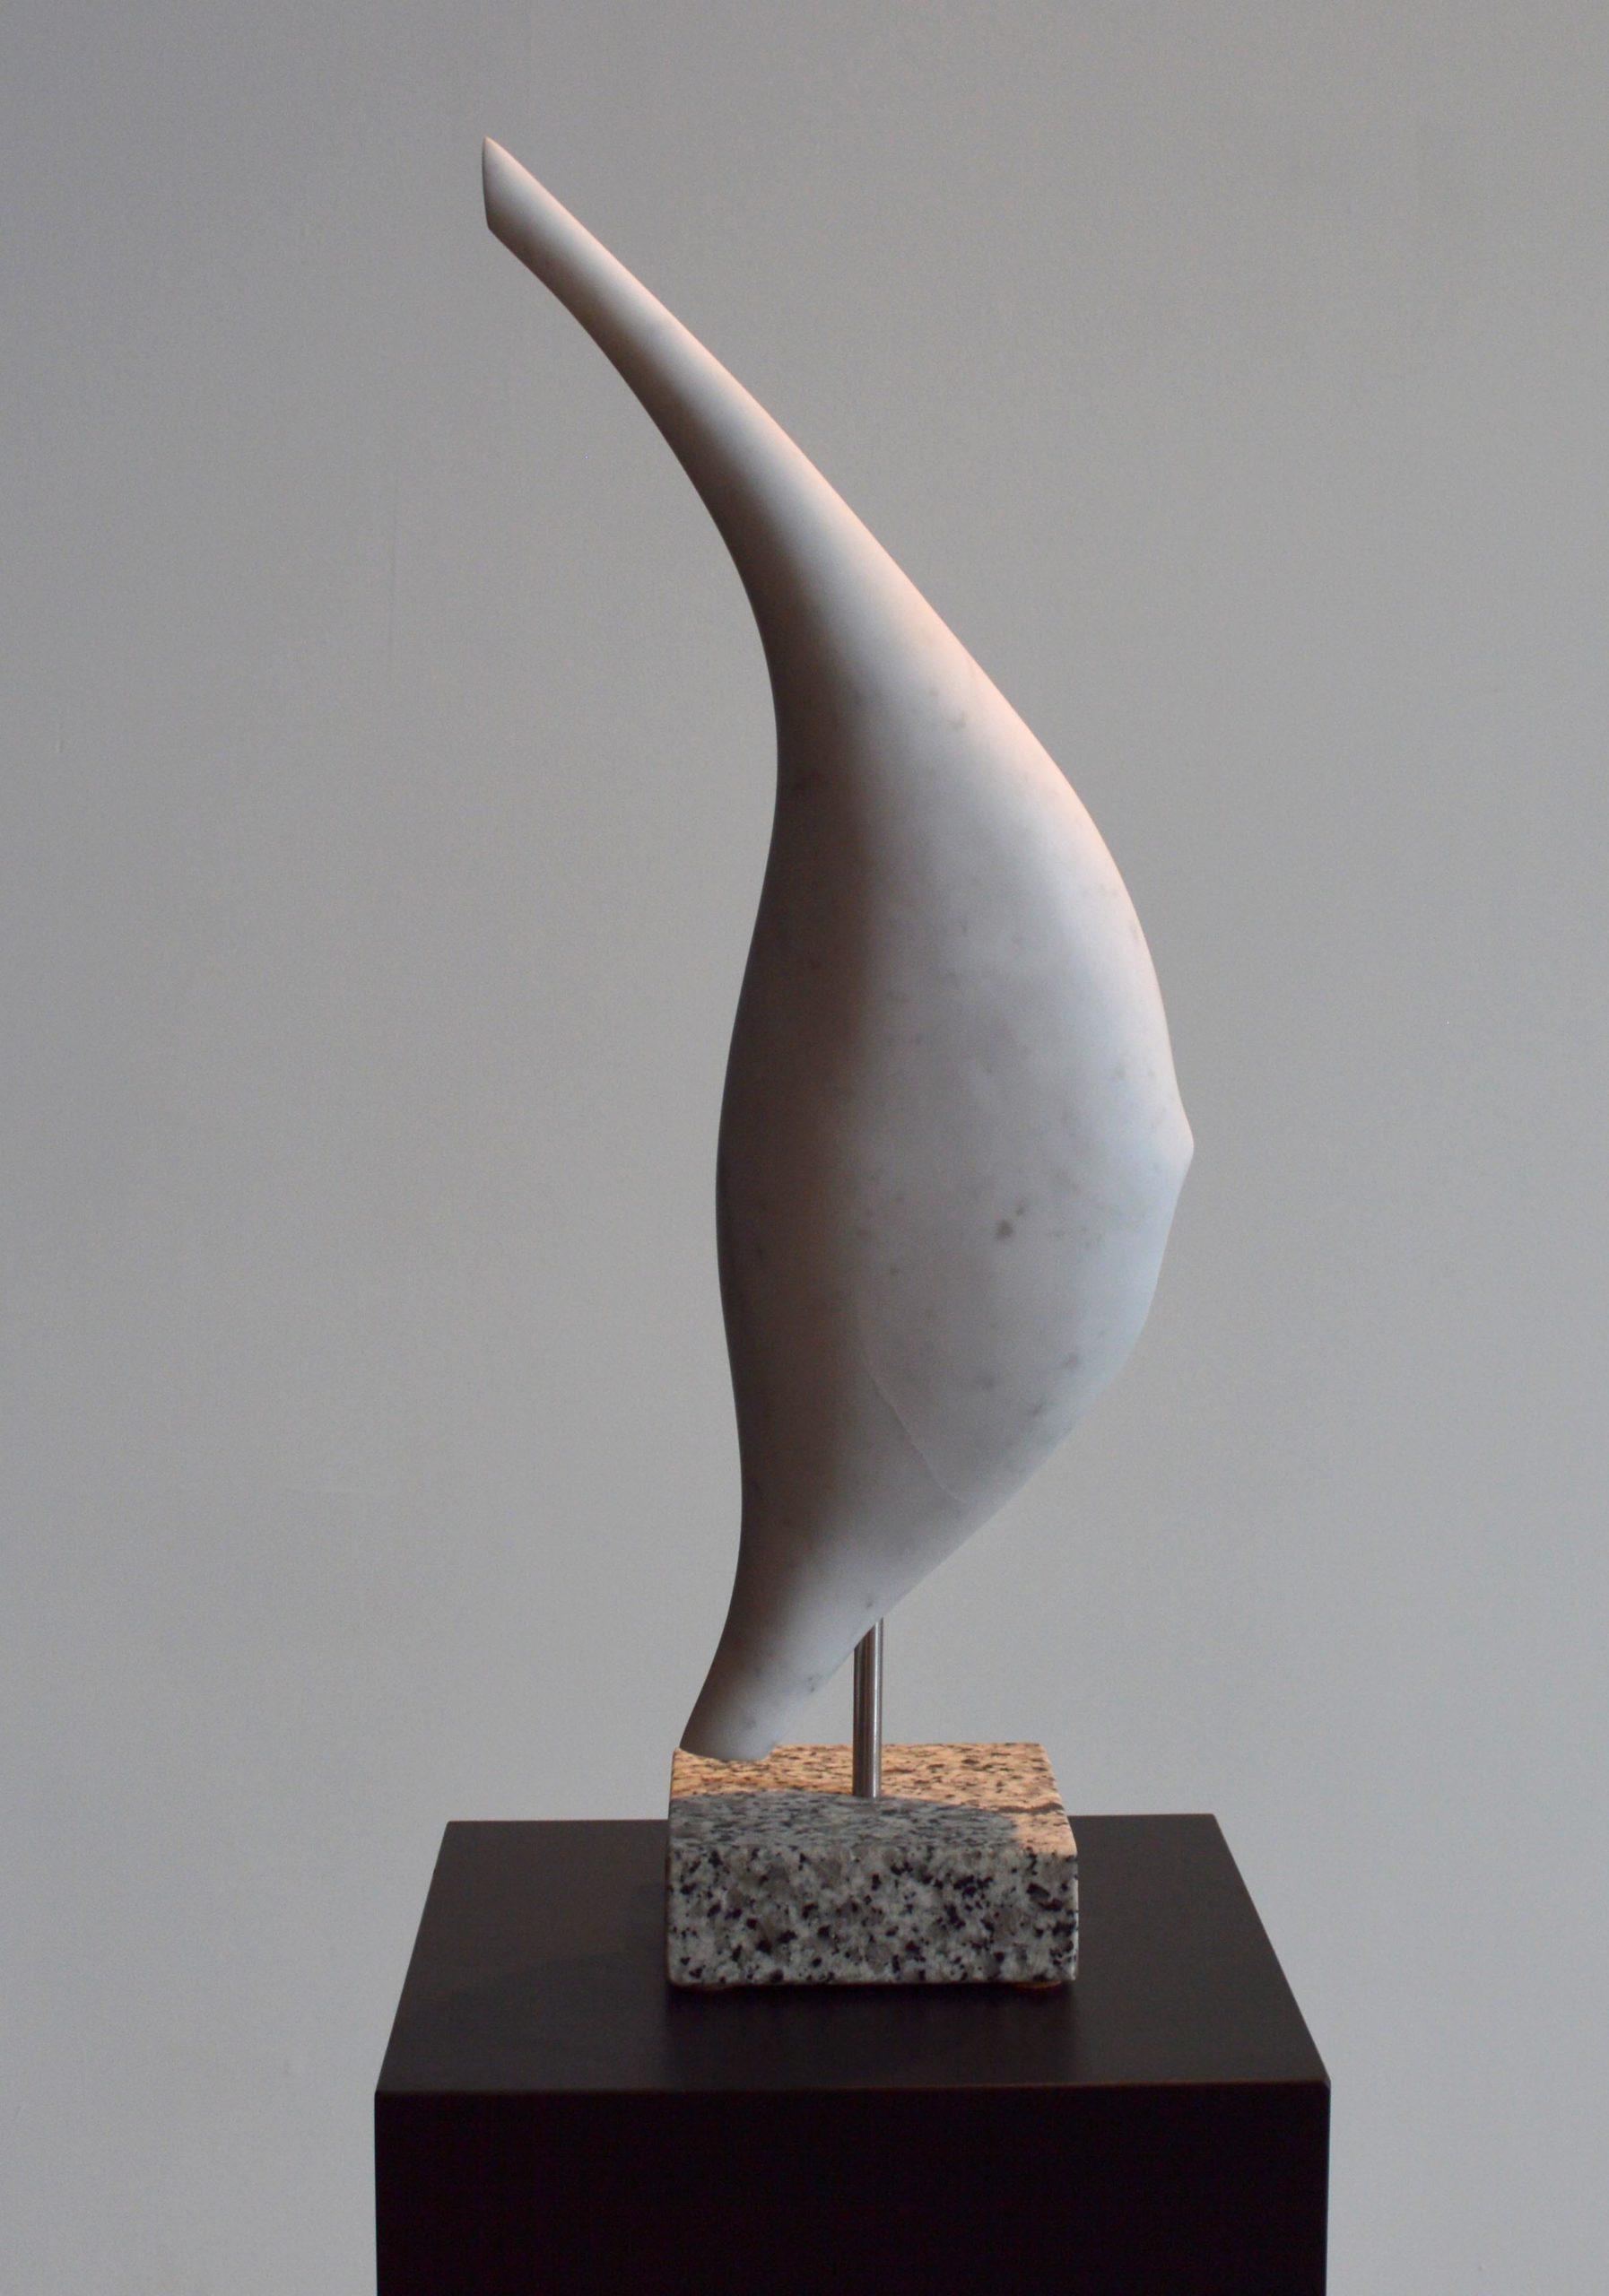 michael binkley sculptor stone sculpture abstract fine art carrara marble vancouver canada